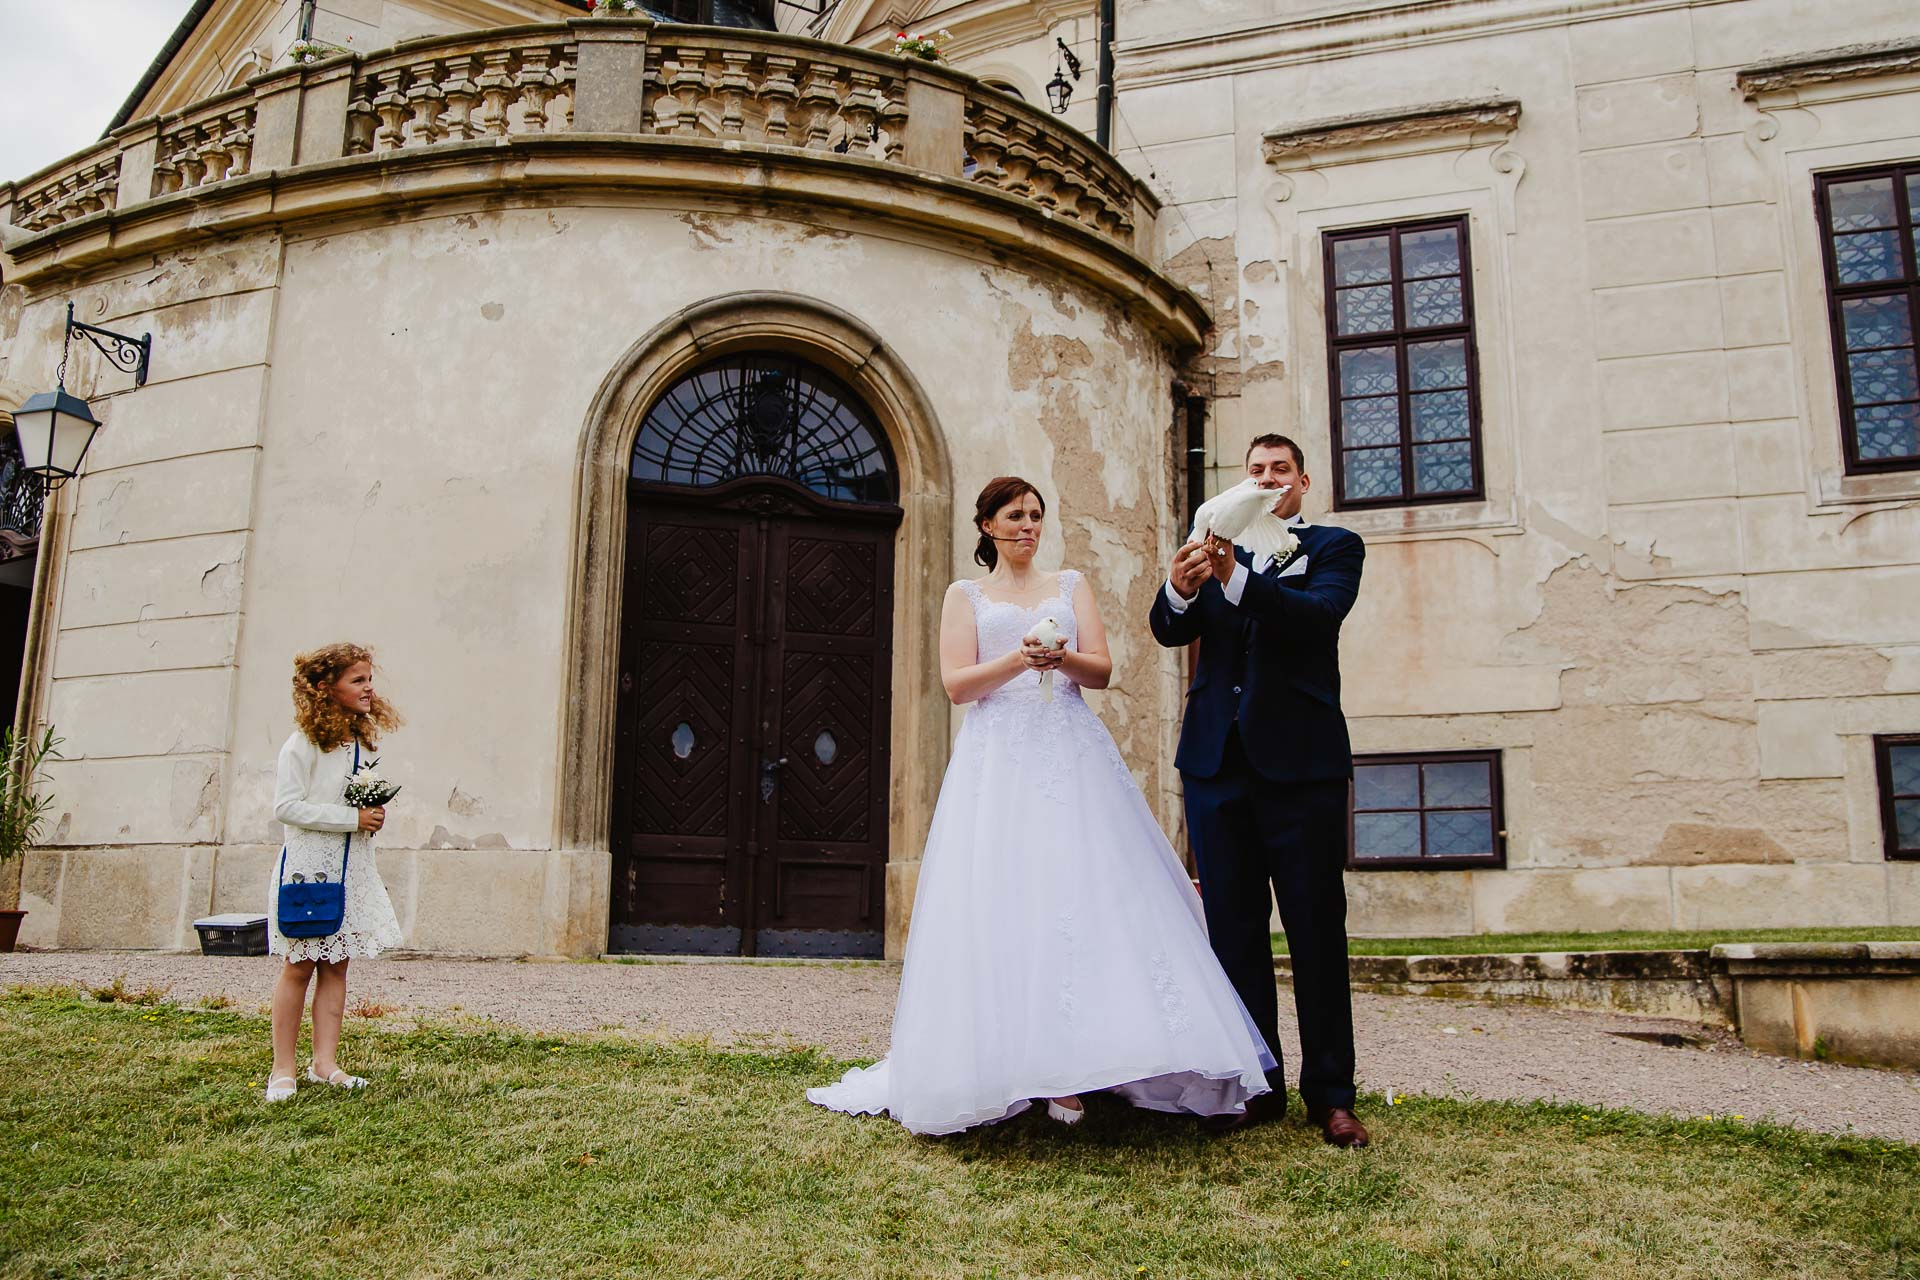 Svatební-fotograf-zámek-Karlova-Koruna-Chlumec-nad-Cidlinou-116